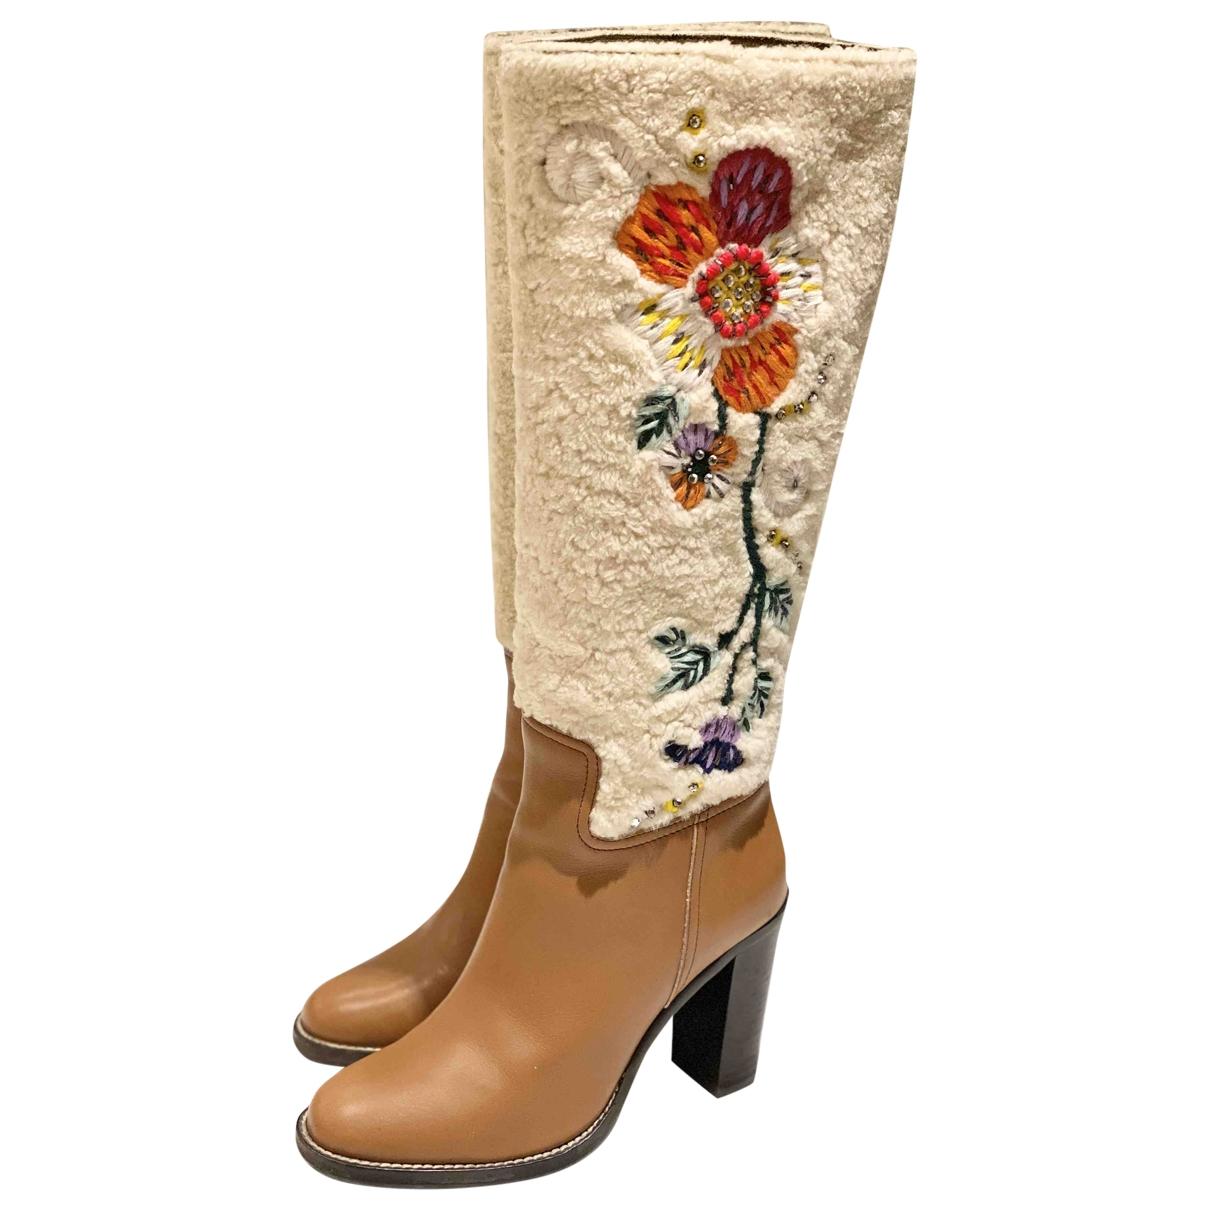 Miu Miu \N Camel Leather Boots for Women 36 EU